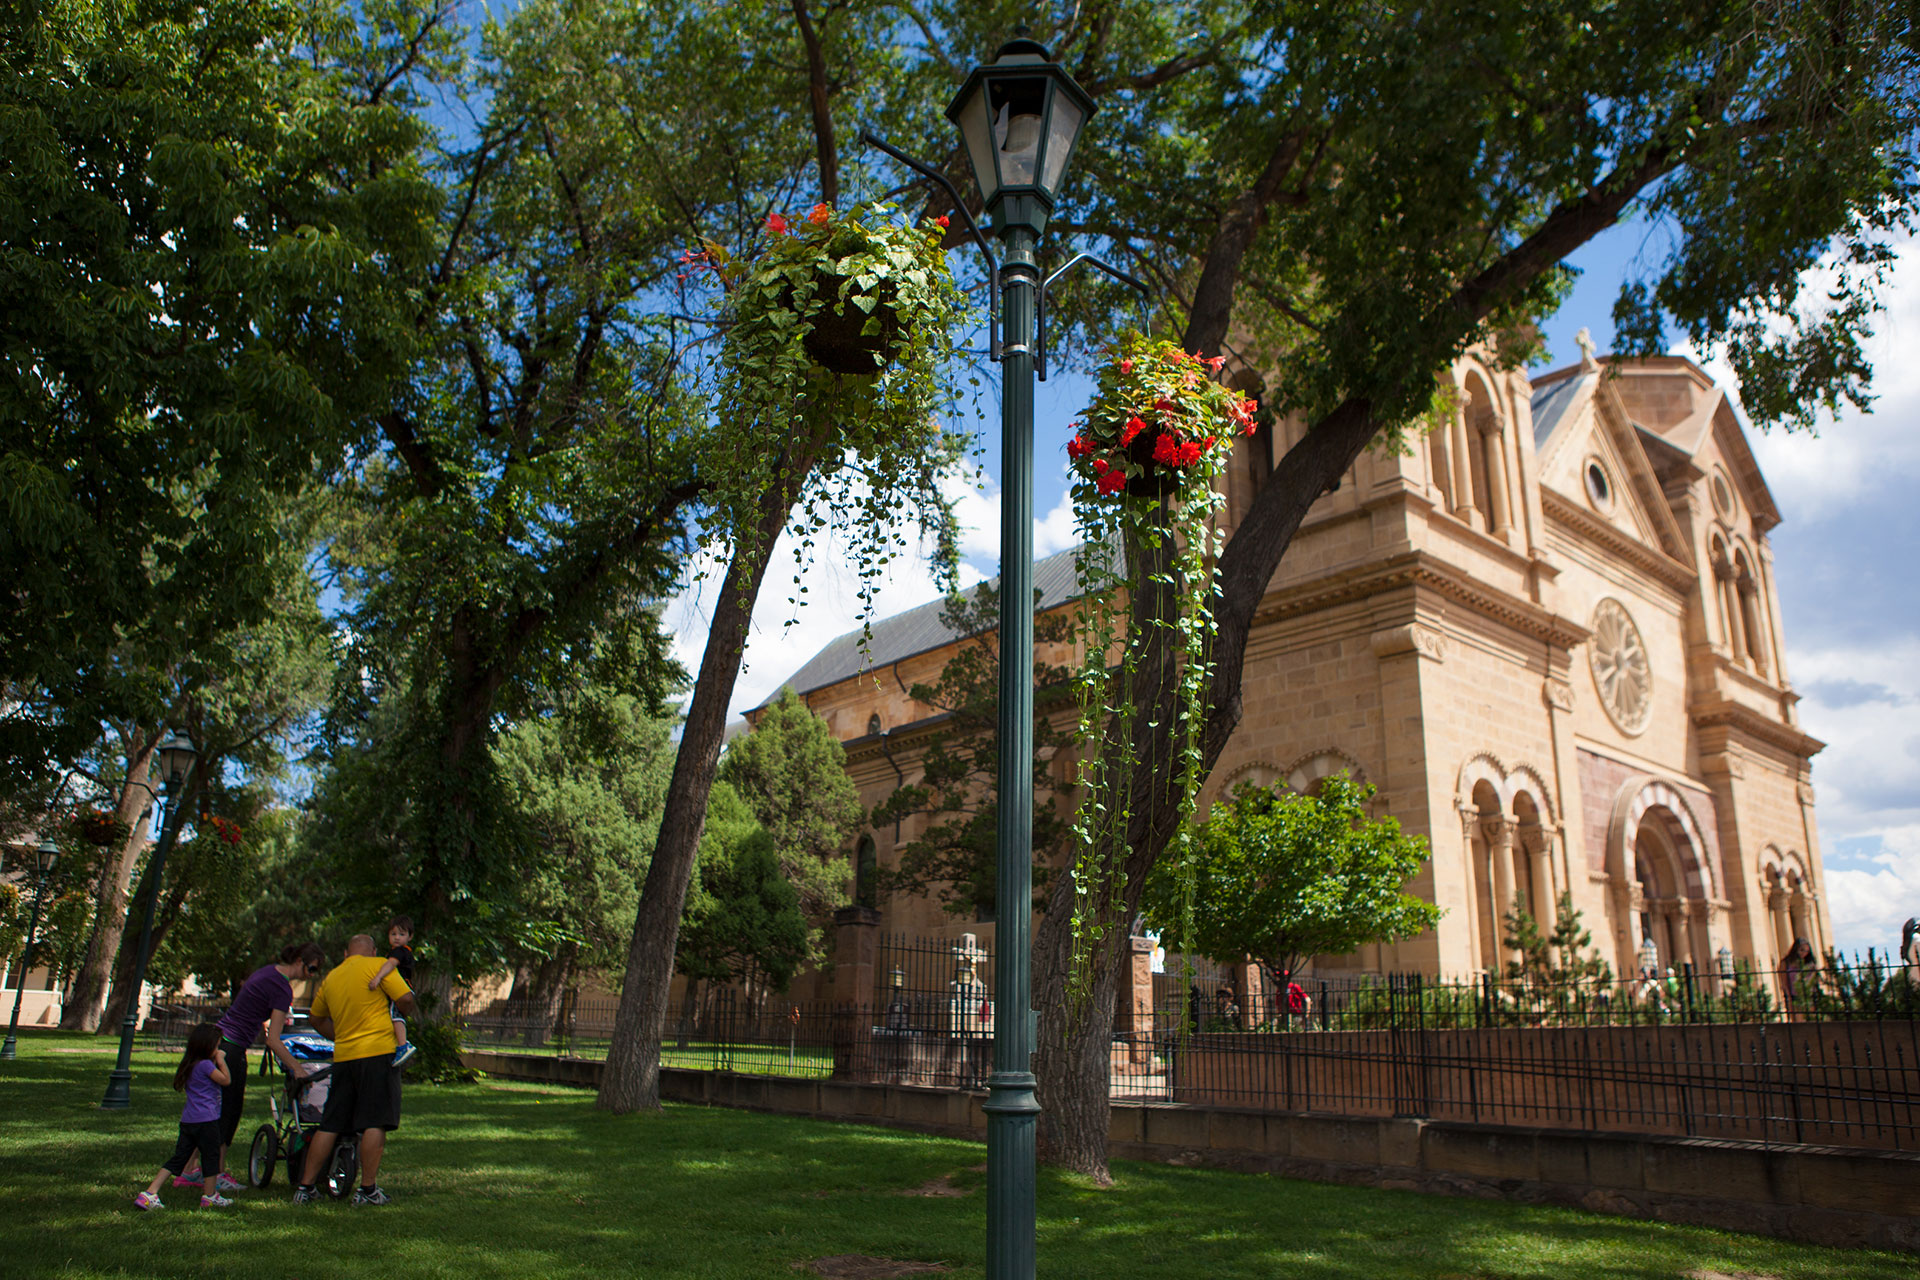 Santa Fe Plaza and Buildings; Courtesy of Tourism Santa Fe